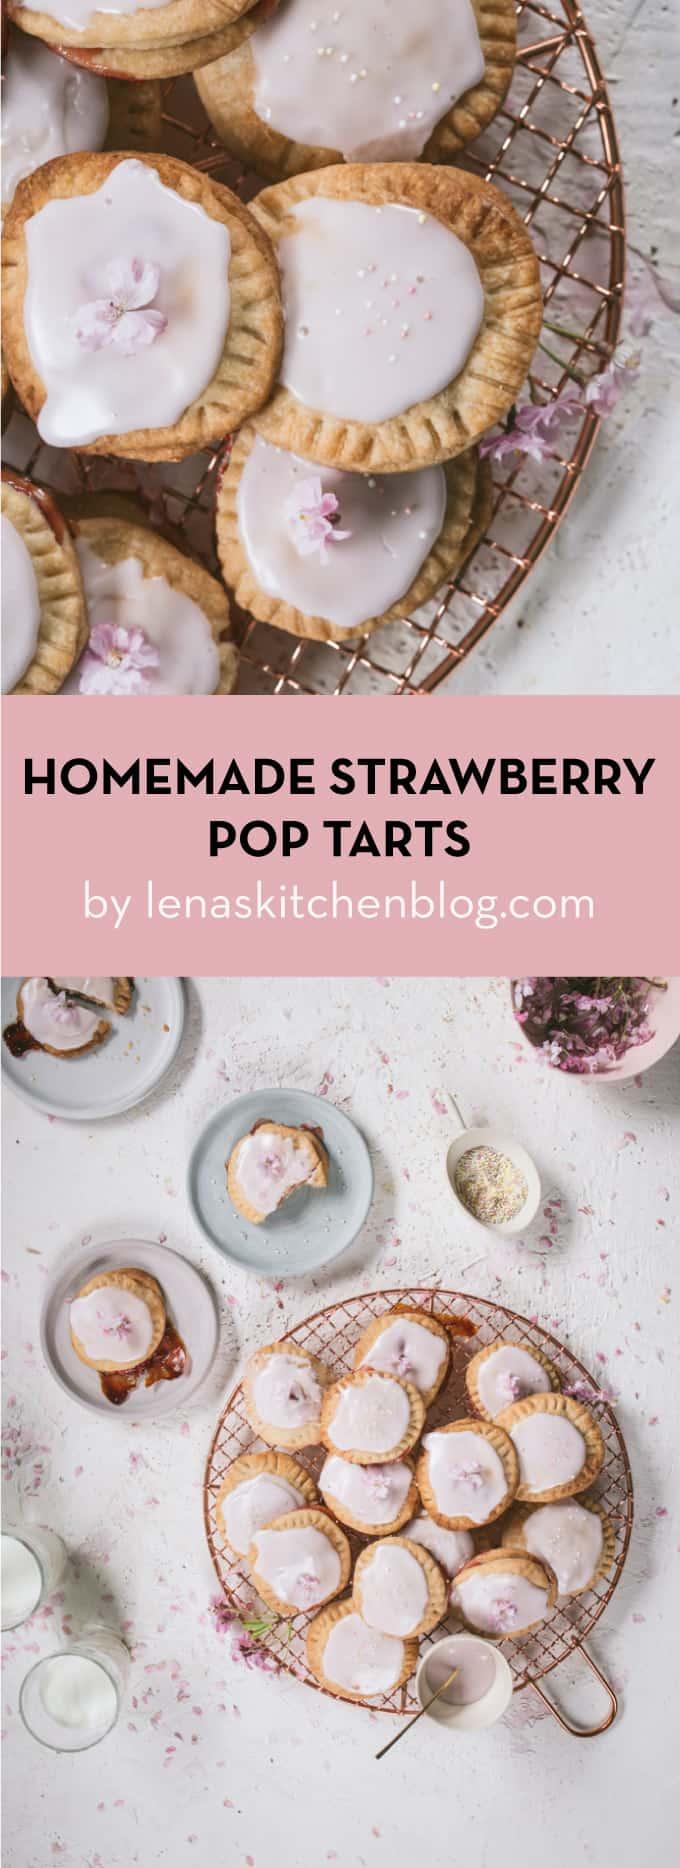 homemade strawberry pop tarts